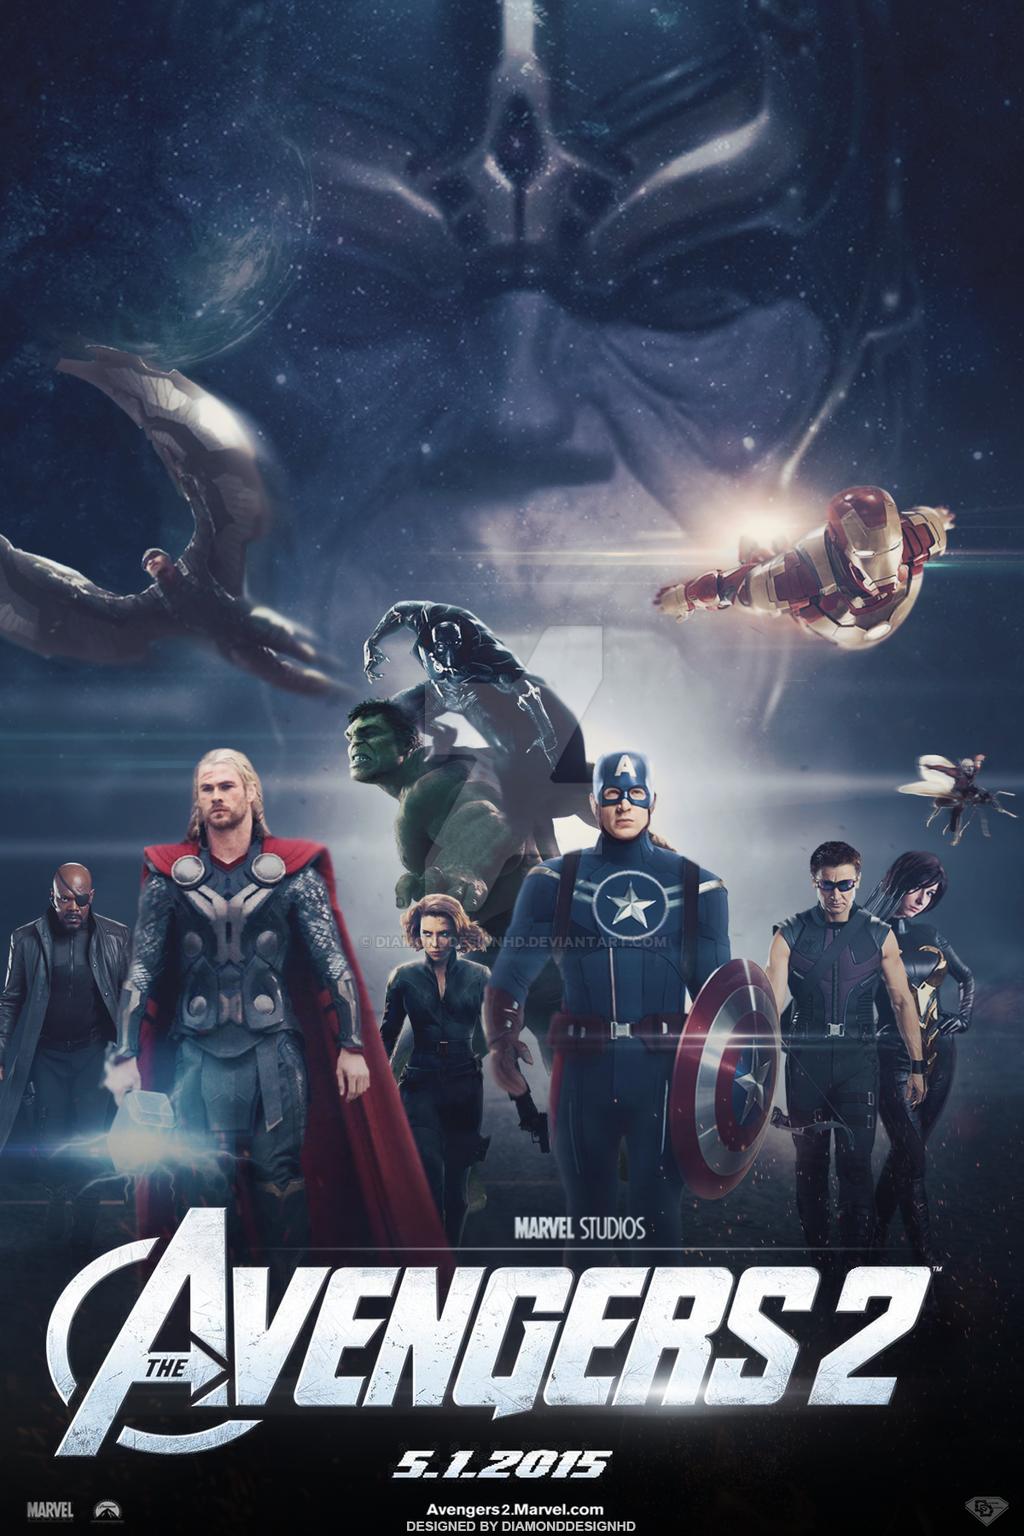 The Avengers 2 (FAN-MADE) Movie Poster v8 by DiamondDesignHD